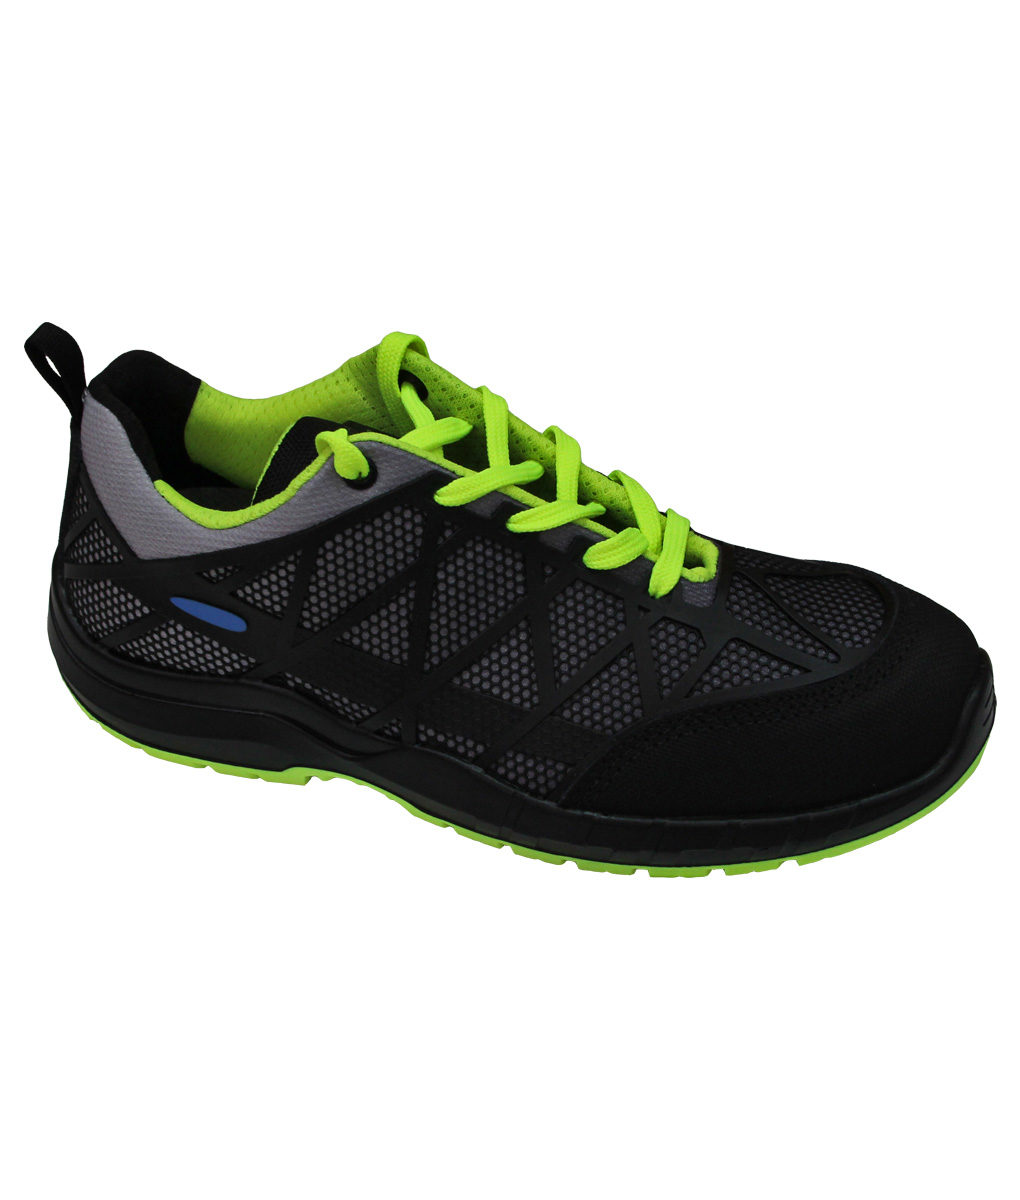 9c83c0ba549 Mugello – Αθλητικά παπούτσια εργασίας S3 SRC. Αρχική · Παπούτσια εργασίας ·  Χαμηλά Παπούτσια Εργασίας; Mugello – Αθλητικά παπούτσια εργασίας ...